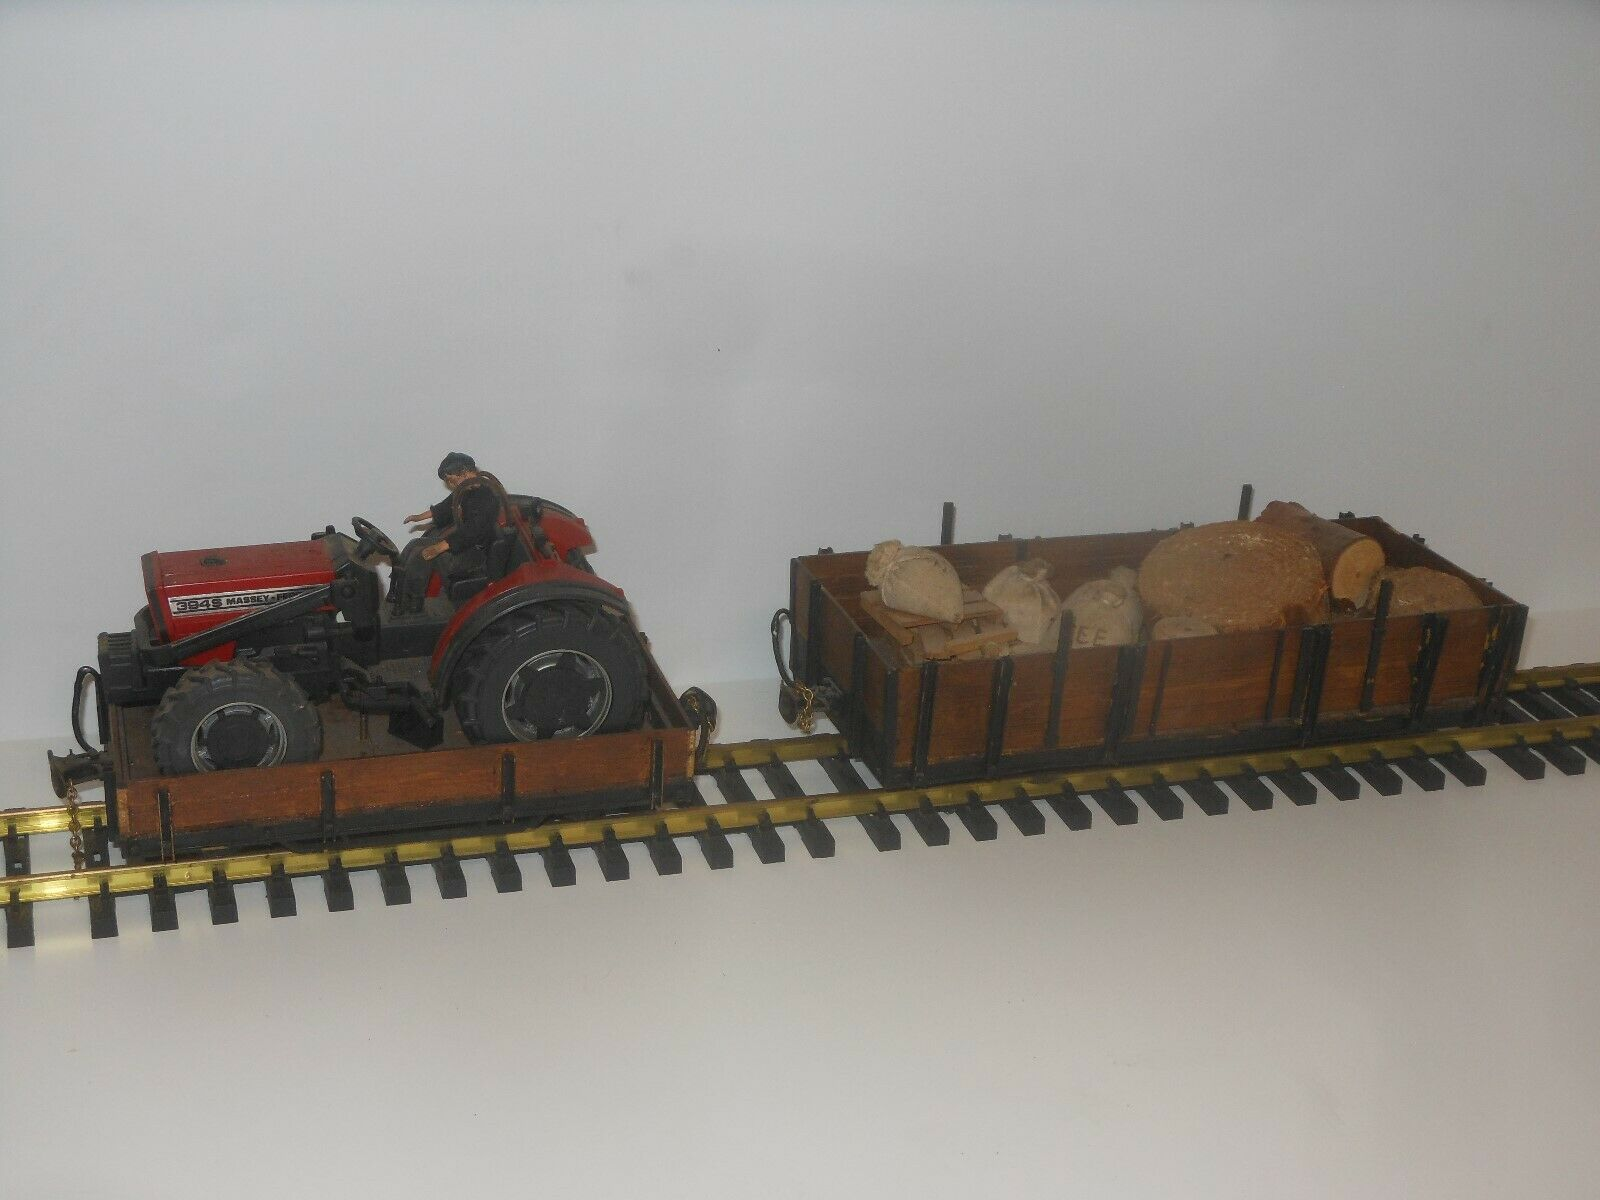 Escala G - Alta Calidad Handarbeitsmodelle - Alto + Vagón de Bordes Bajos con